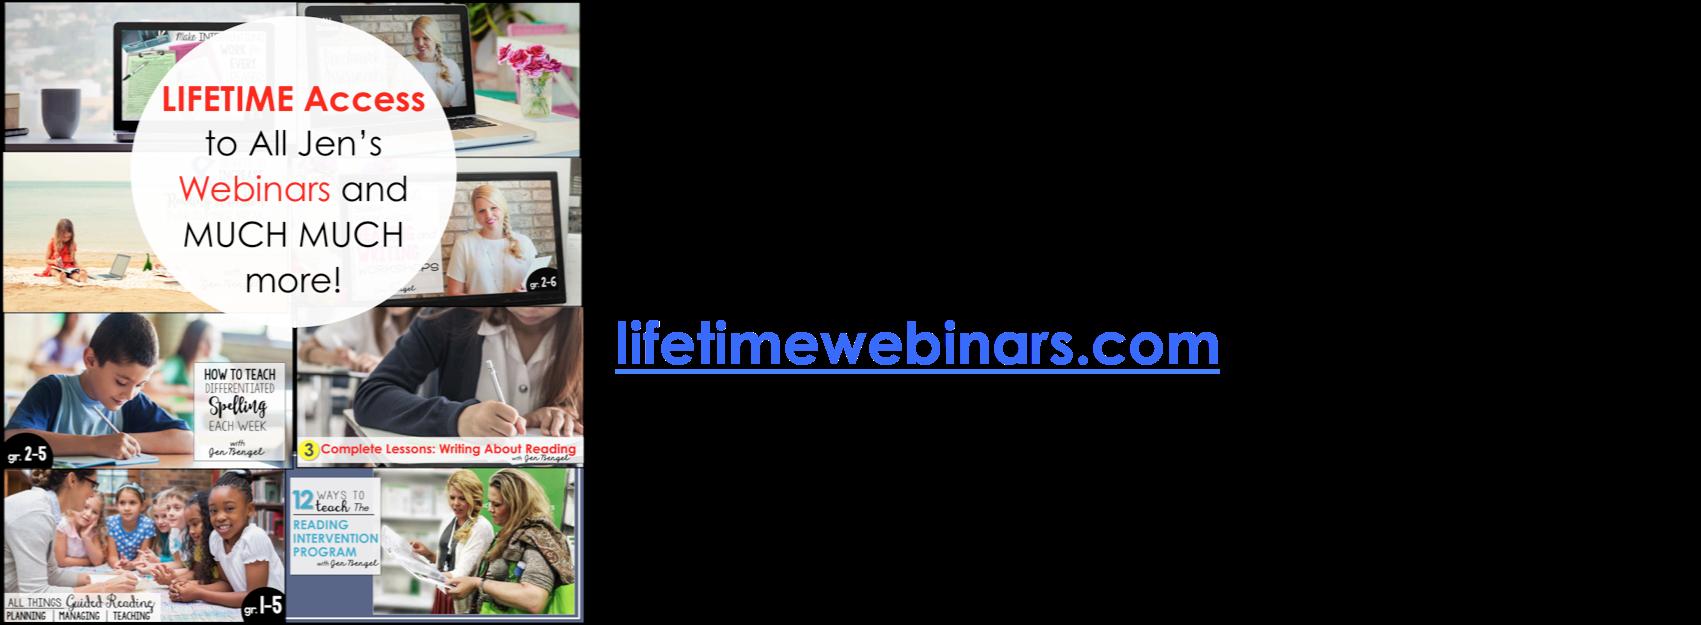 http://jenbengel.teachable.com/p/lifetime-webinar-access-from-jen-bengel